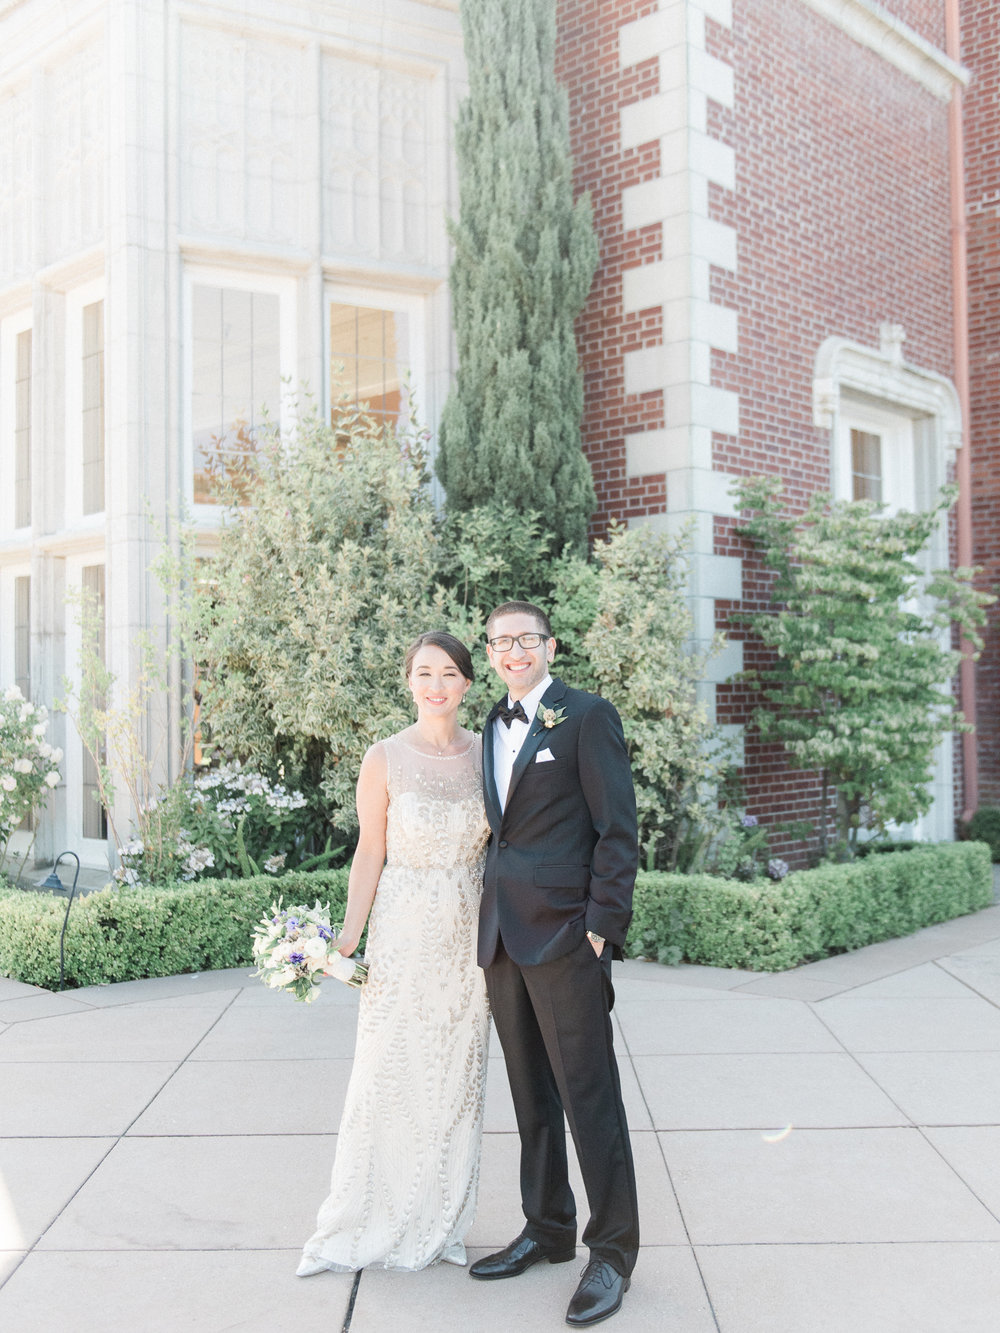 Sarah+Warren_wedding_spp-117.jpg